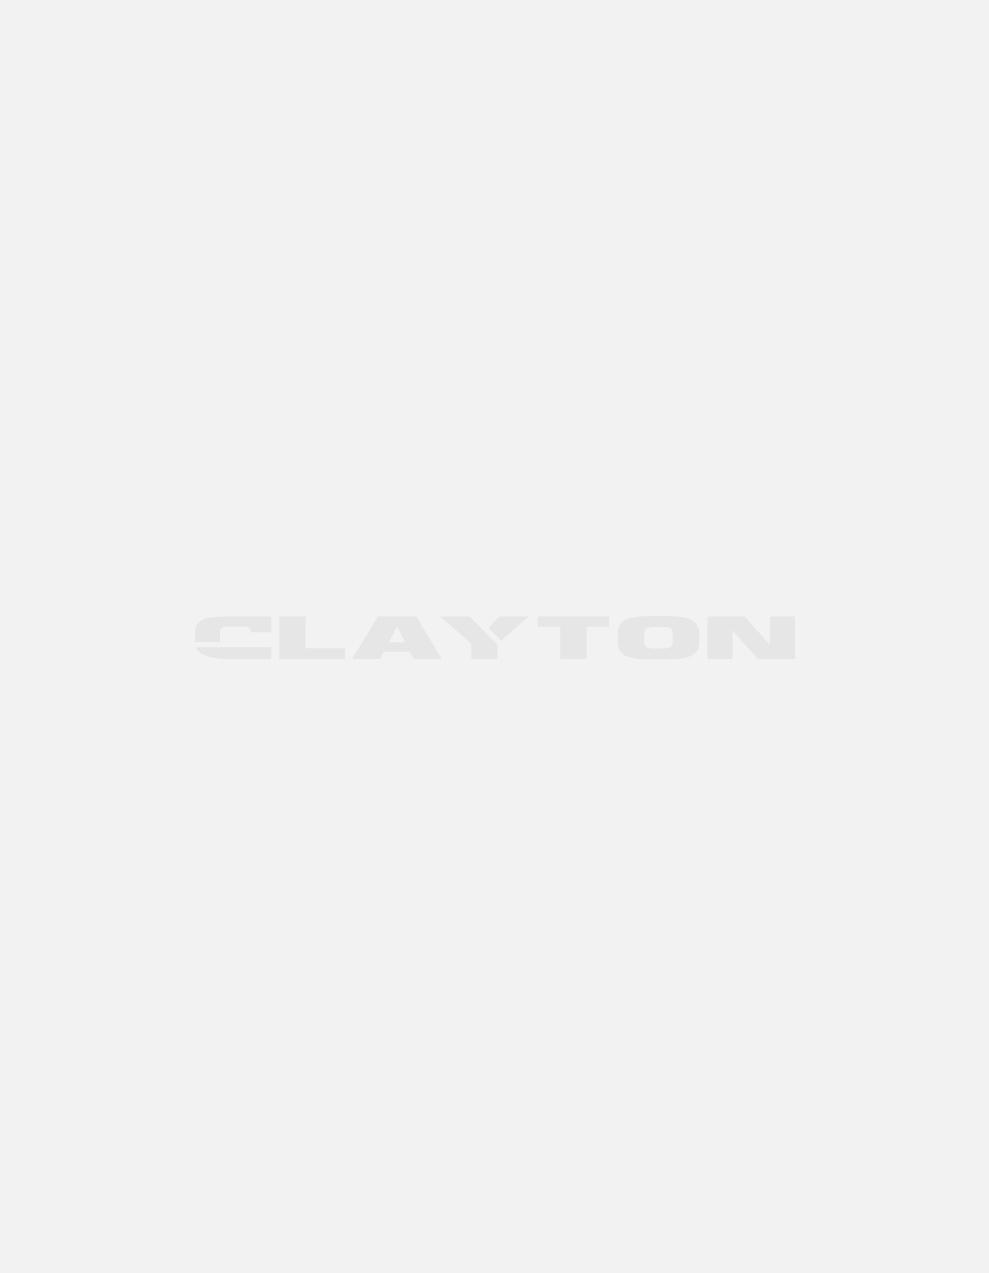 https://www.claytonitalia.com/media/catalog/product/cache/5/small_image/460x590/9df78eab33525d08d6e5fb8d27136e95/g/i/gift54_nt.jpg